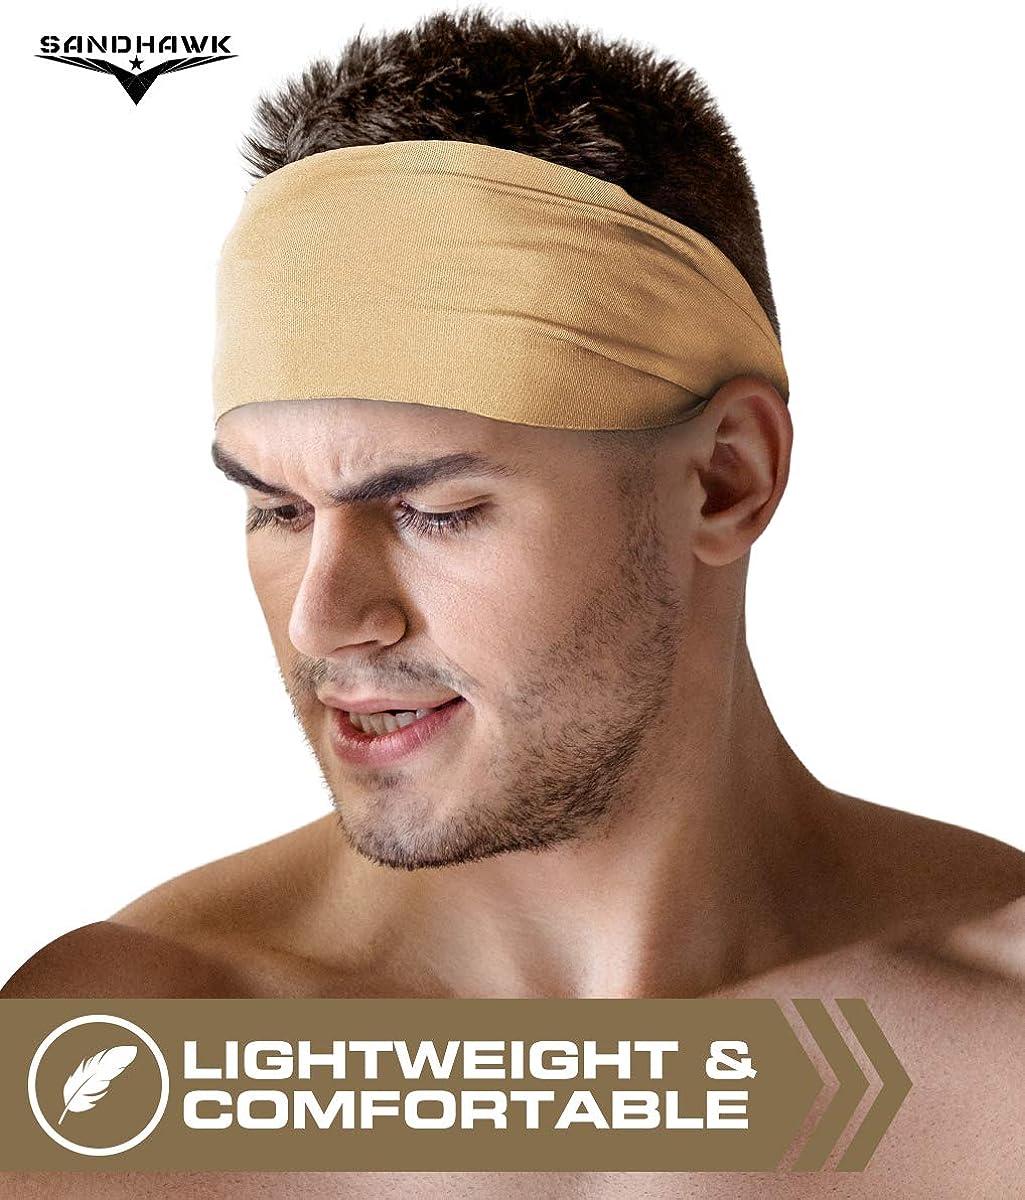 Unisex Sweatband Headband Strap Home Sports Yoga Gym Running Fitness Exercise